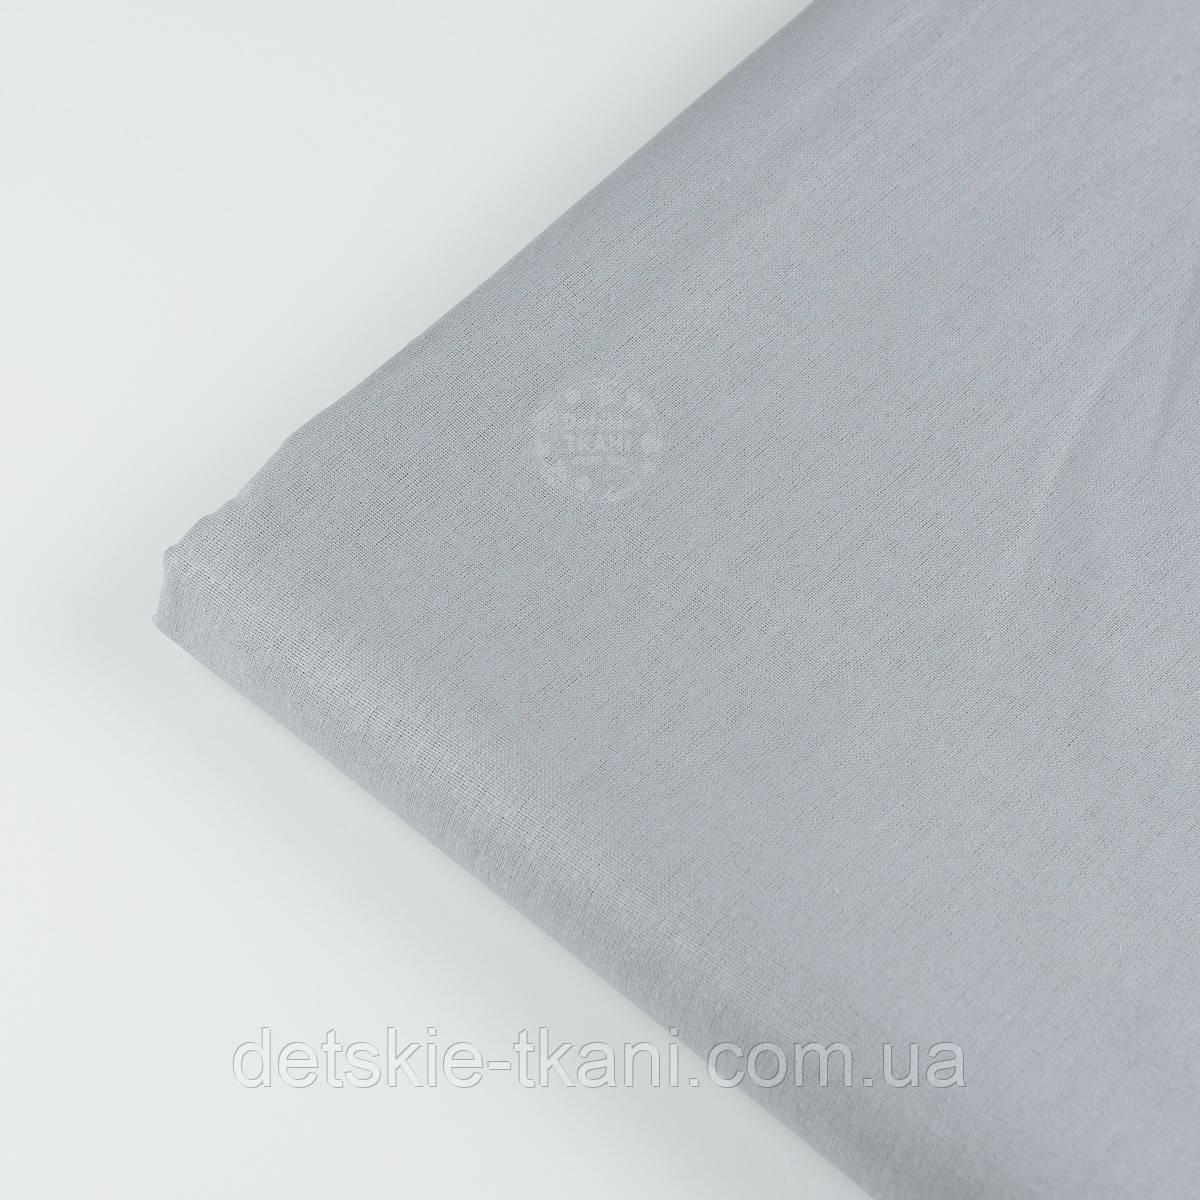 Лоскут ткани №55а тёмно-серого цвета